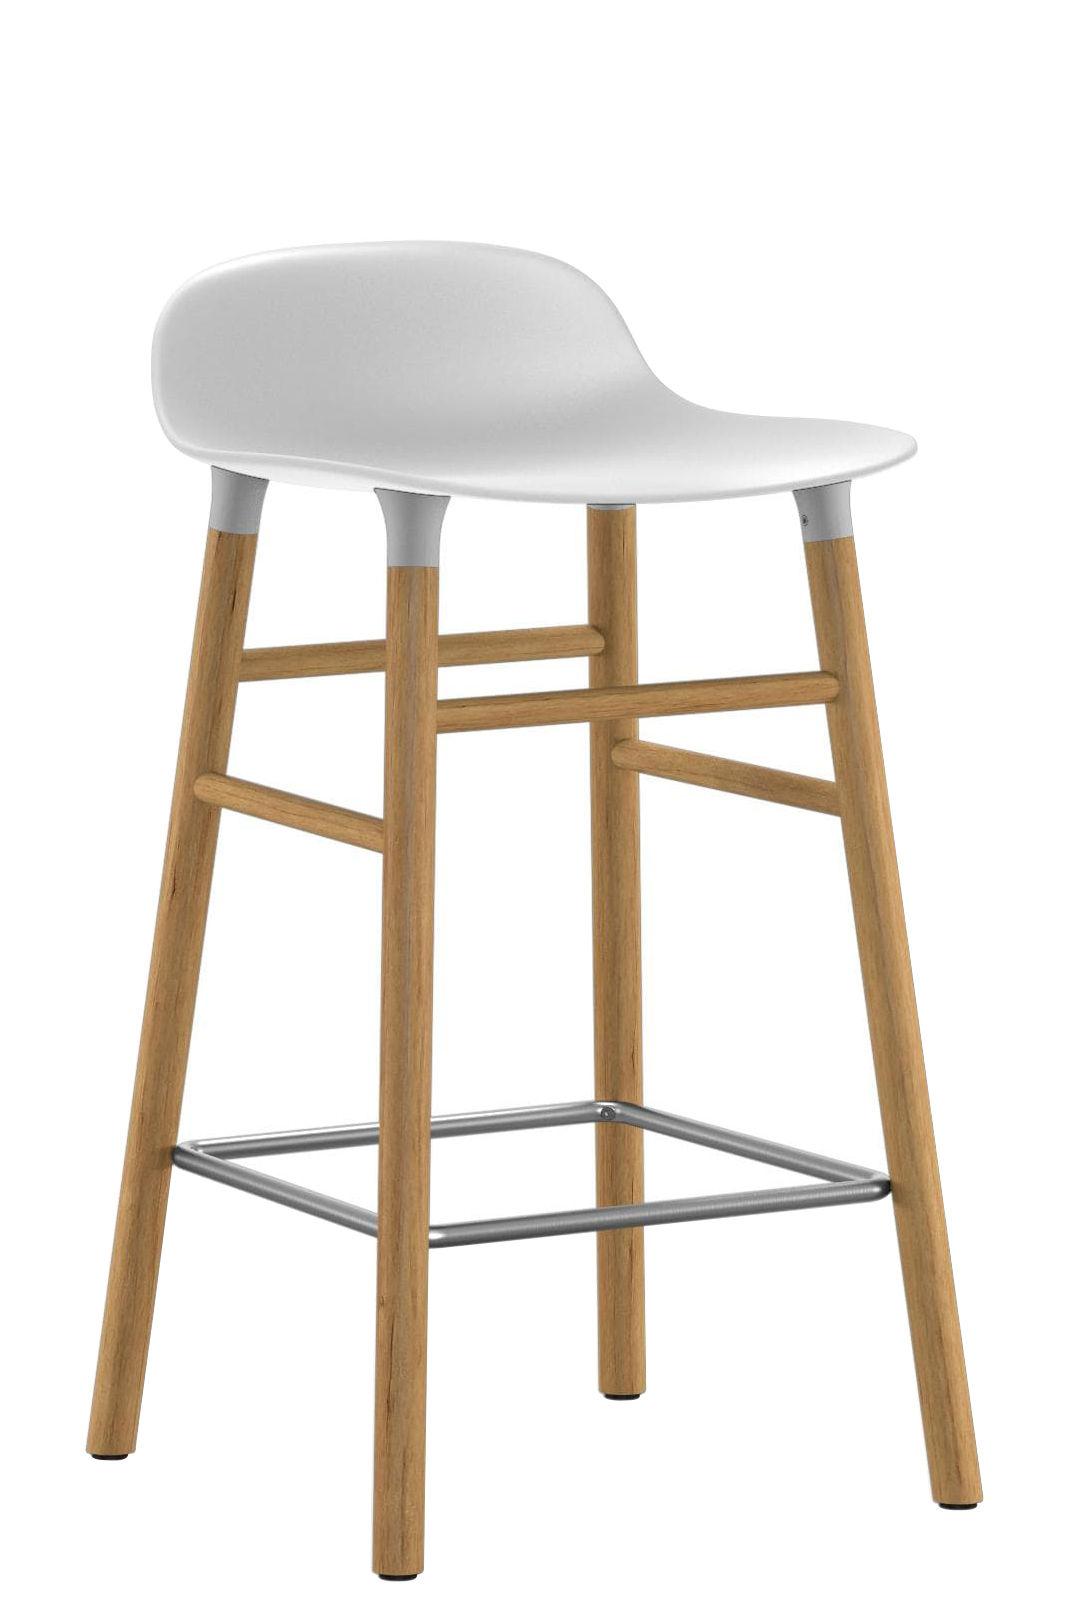 Mobilier - Tabourets de bar - Tabouret de bar Form / H 65 cm - Pied chêne - Normann Copenhagen - Blanc / chêne - Chêne, Polypropylène